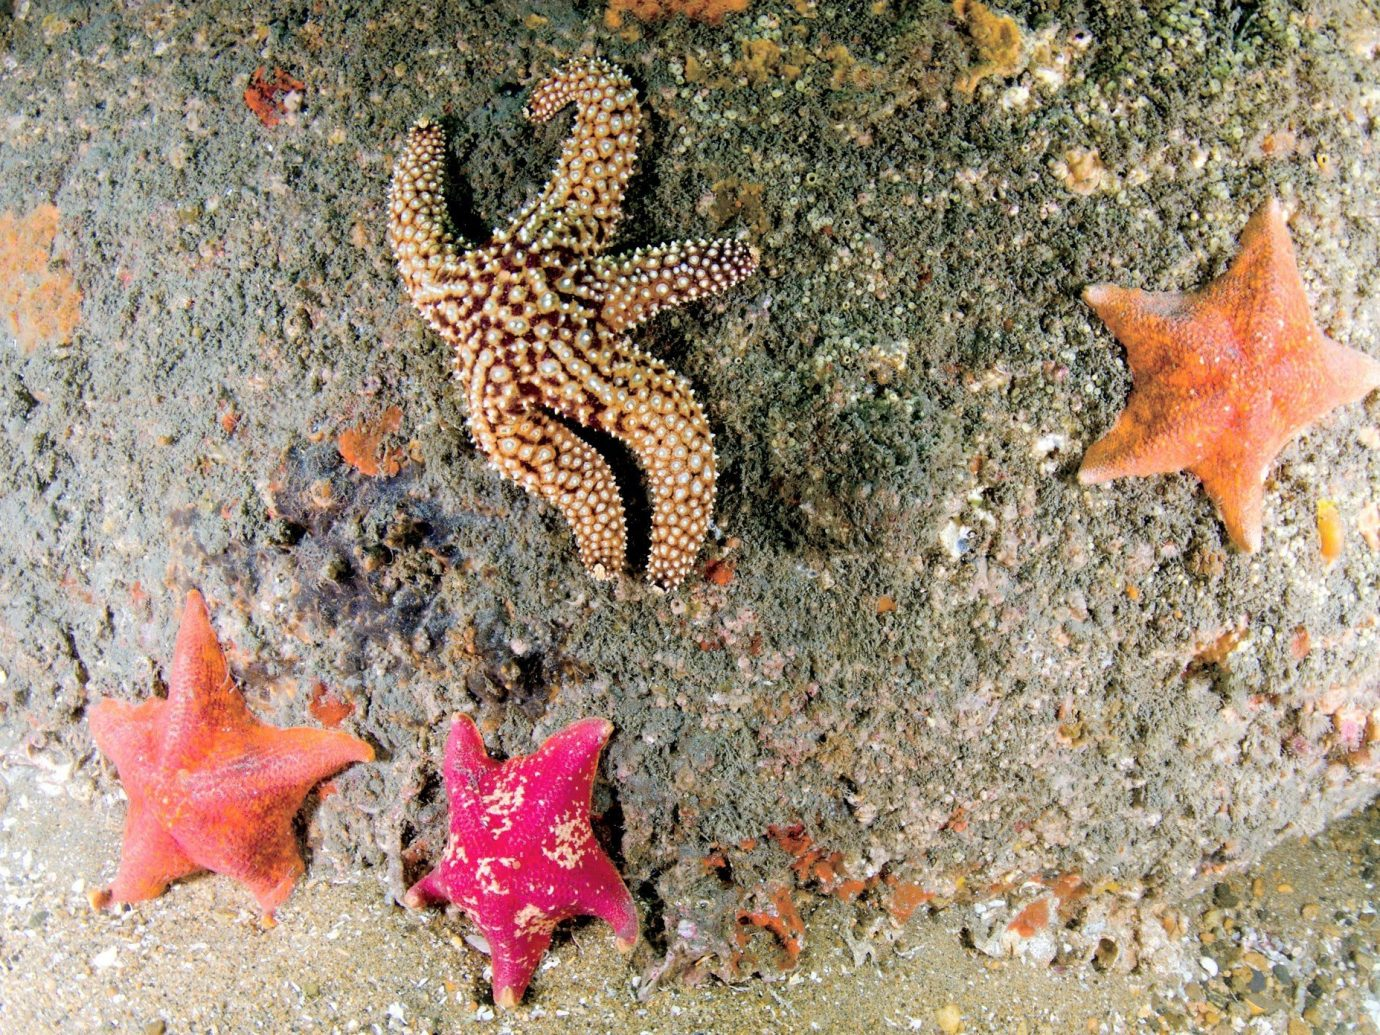 Hotels starfish animal echinoderm marine biology outdoor fauna marine invertebrates invertebrate biology coral